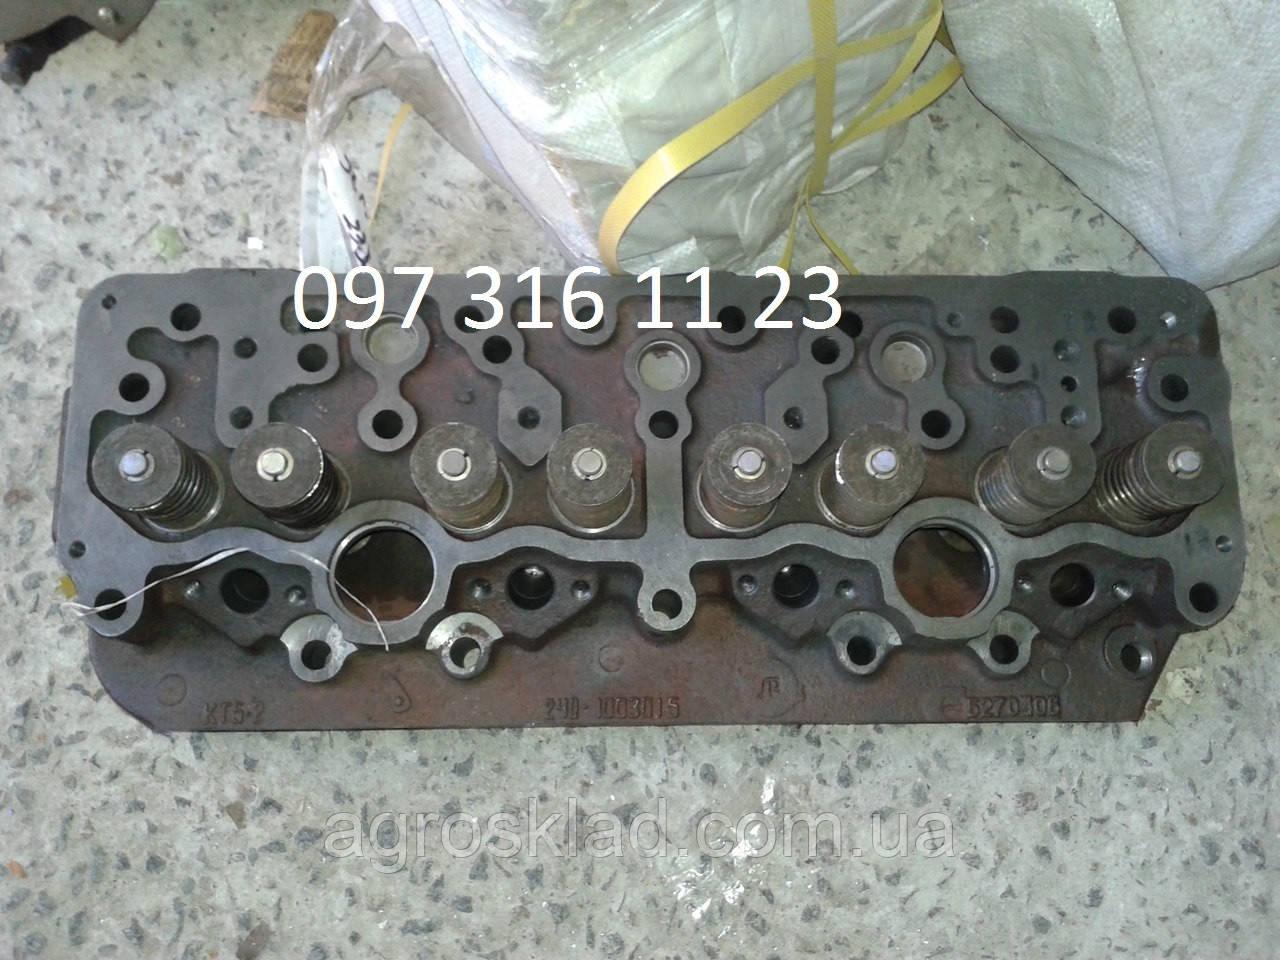 Головка блока цилиндров МТЗ  4 шпильки 240-1003012